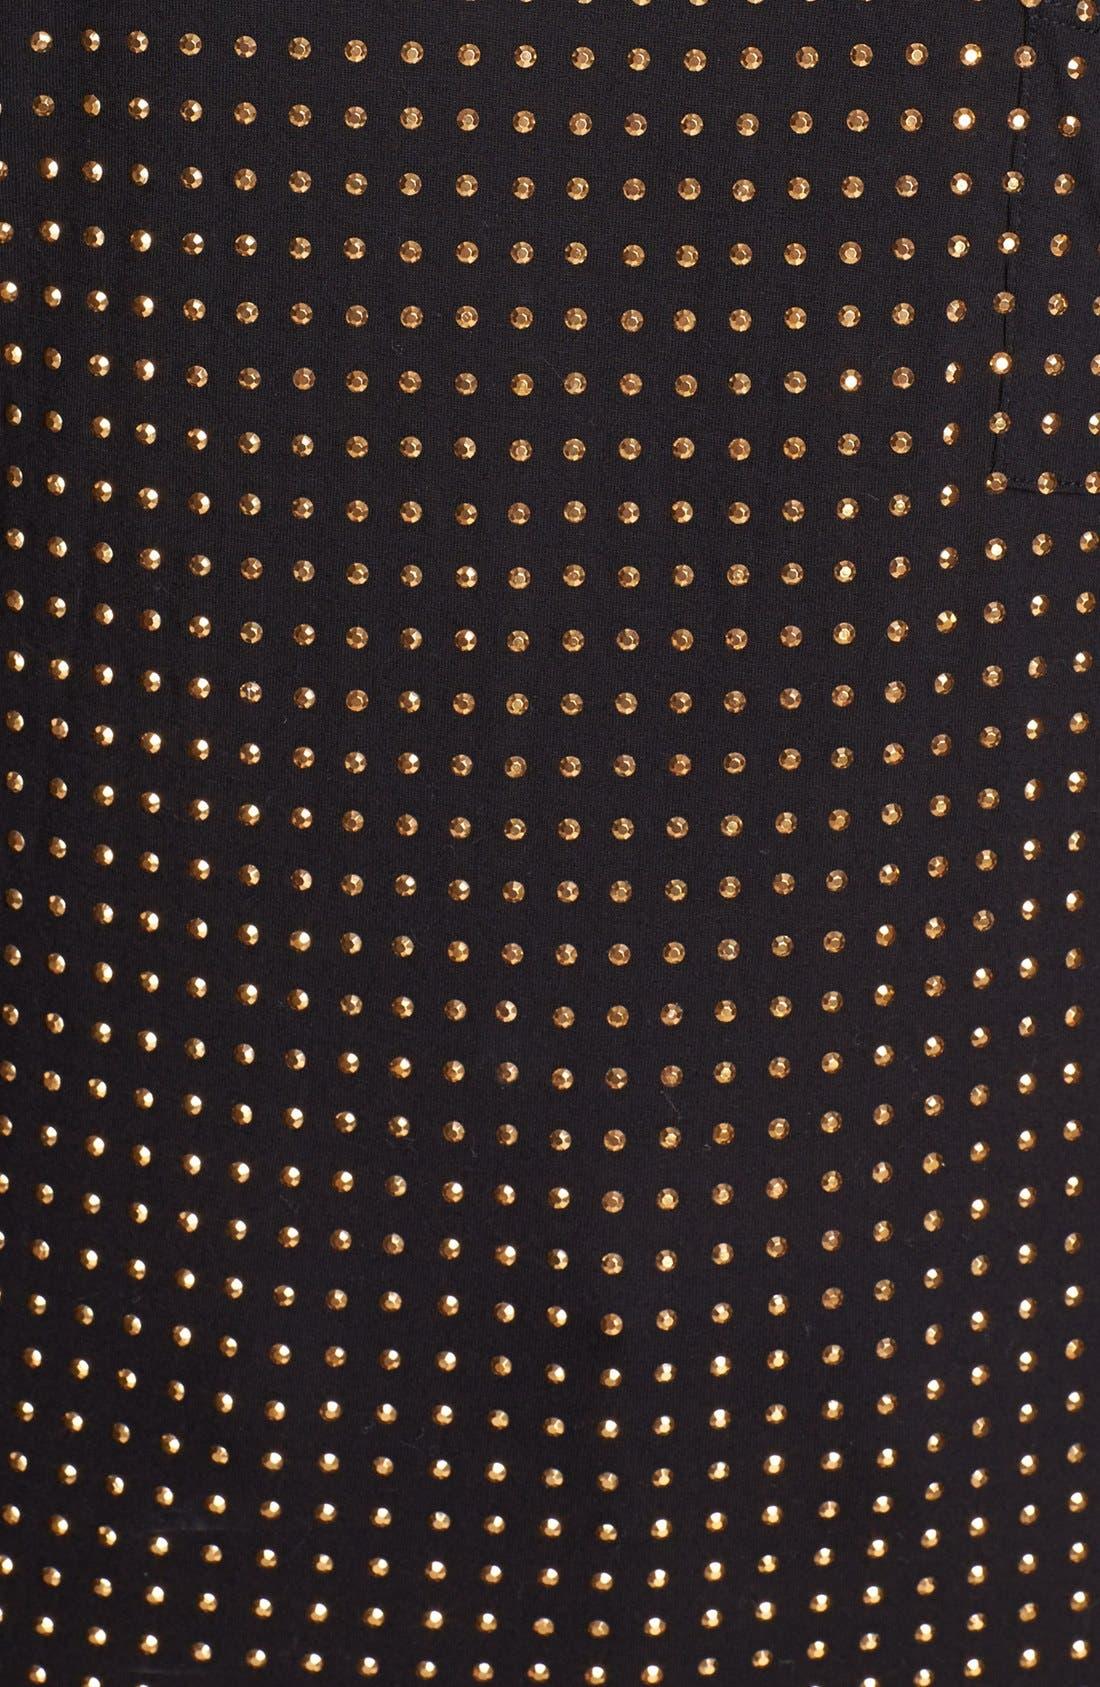 Alternate Image 3  - MICHAEL Michael Kors Studded Knit Top